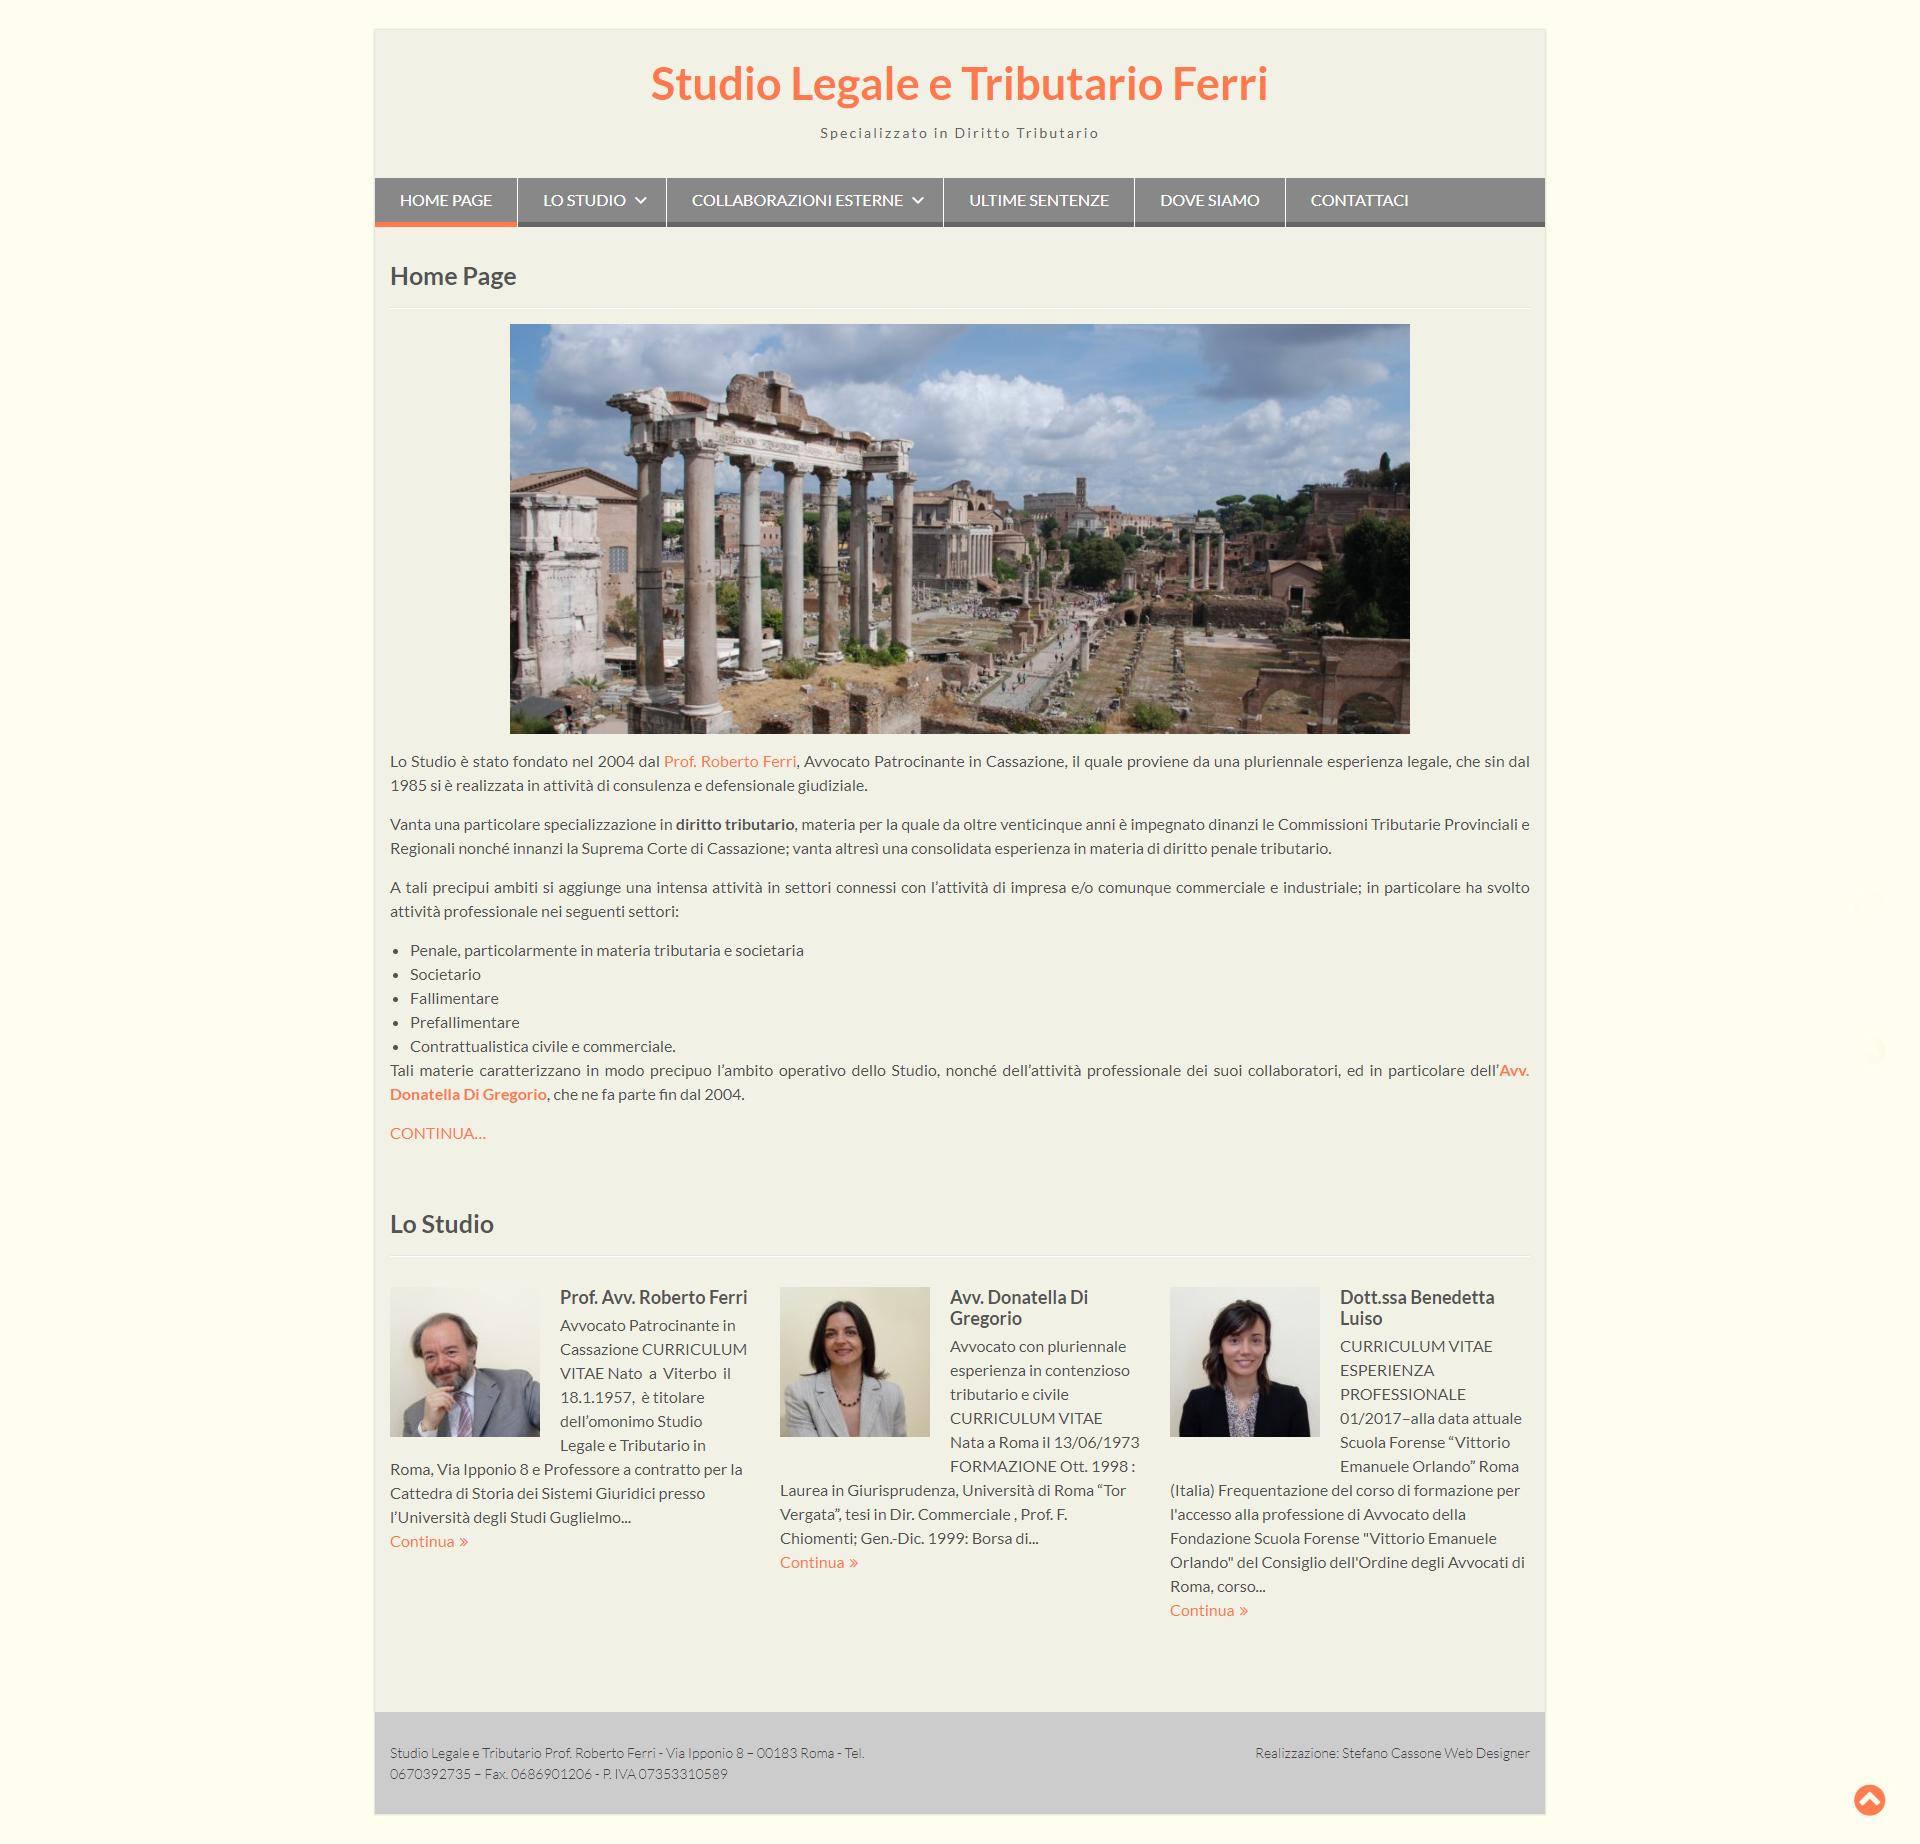 Studio Legale e Tributario Ferri